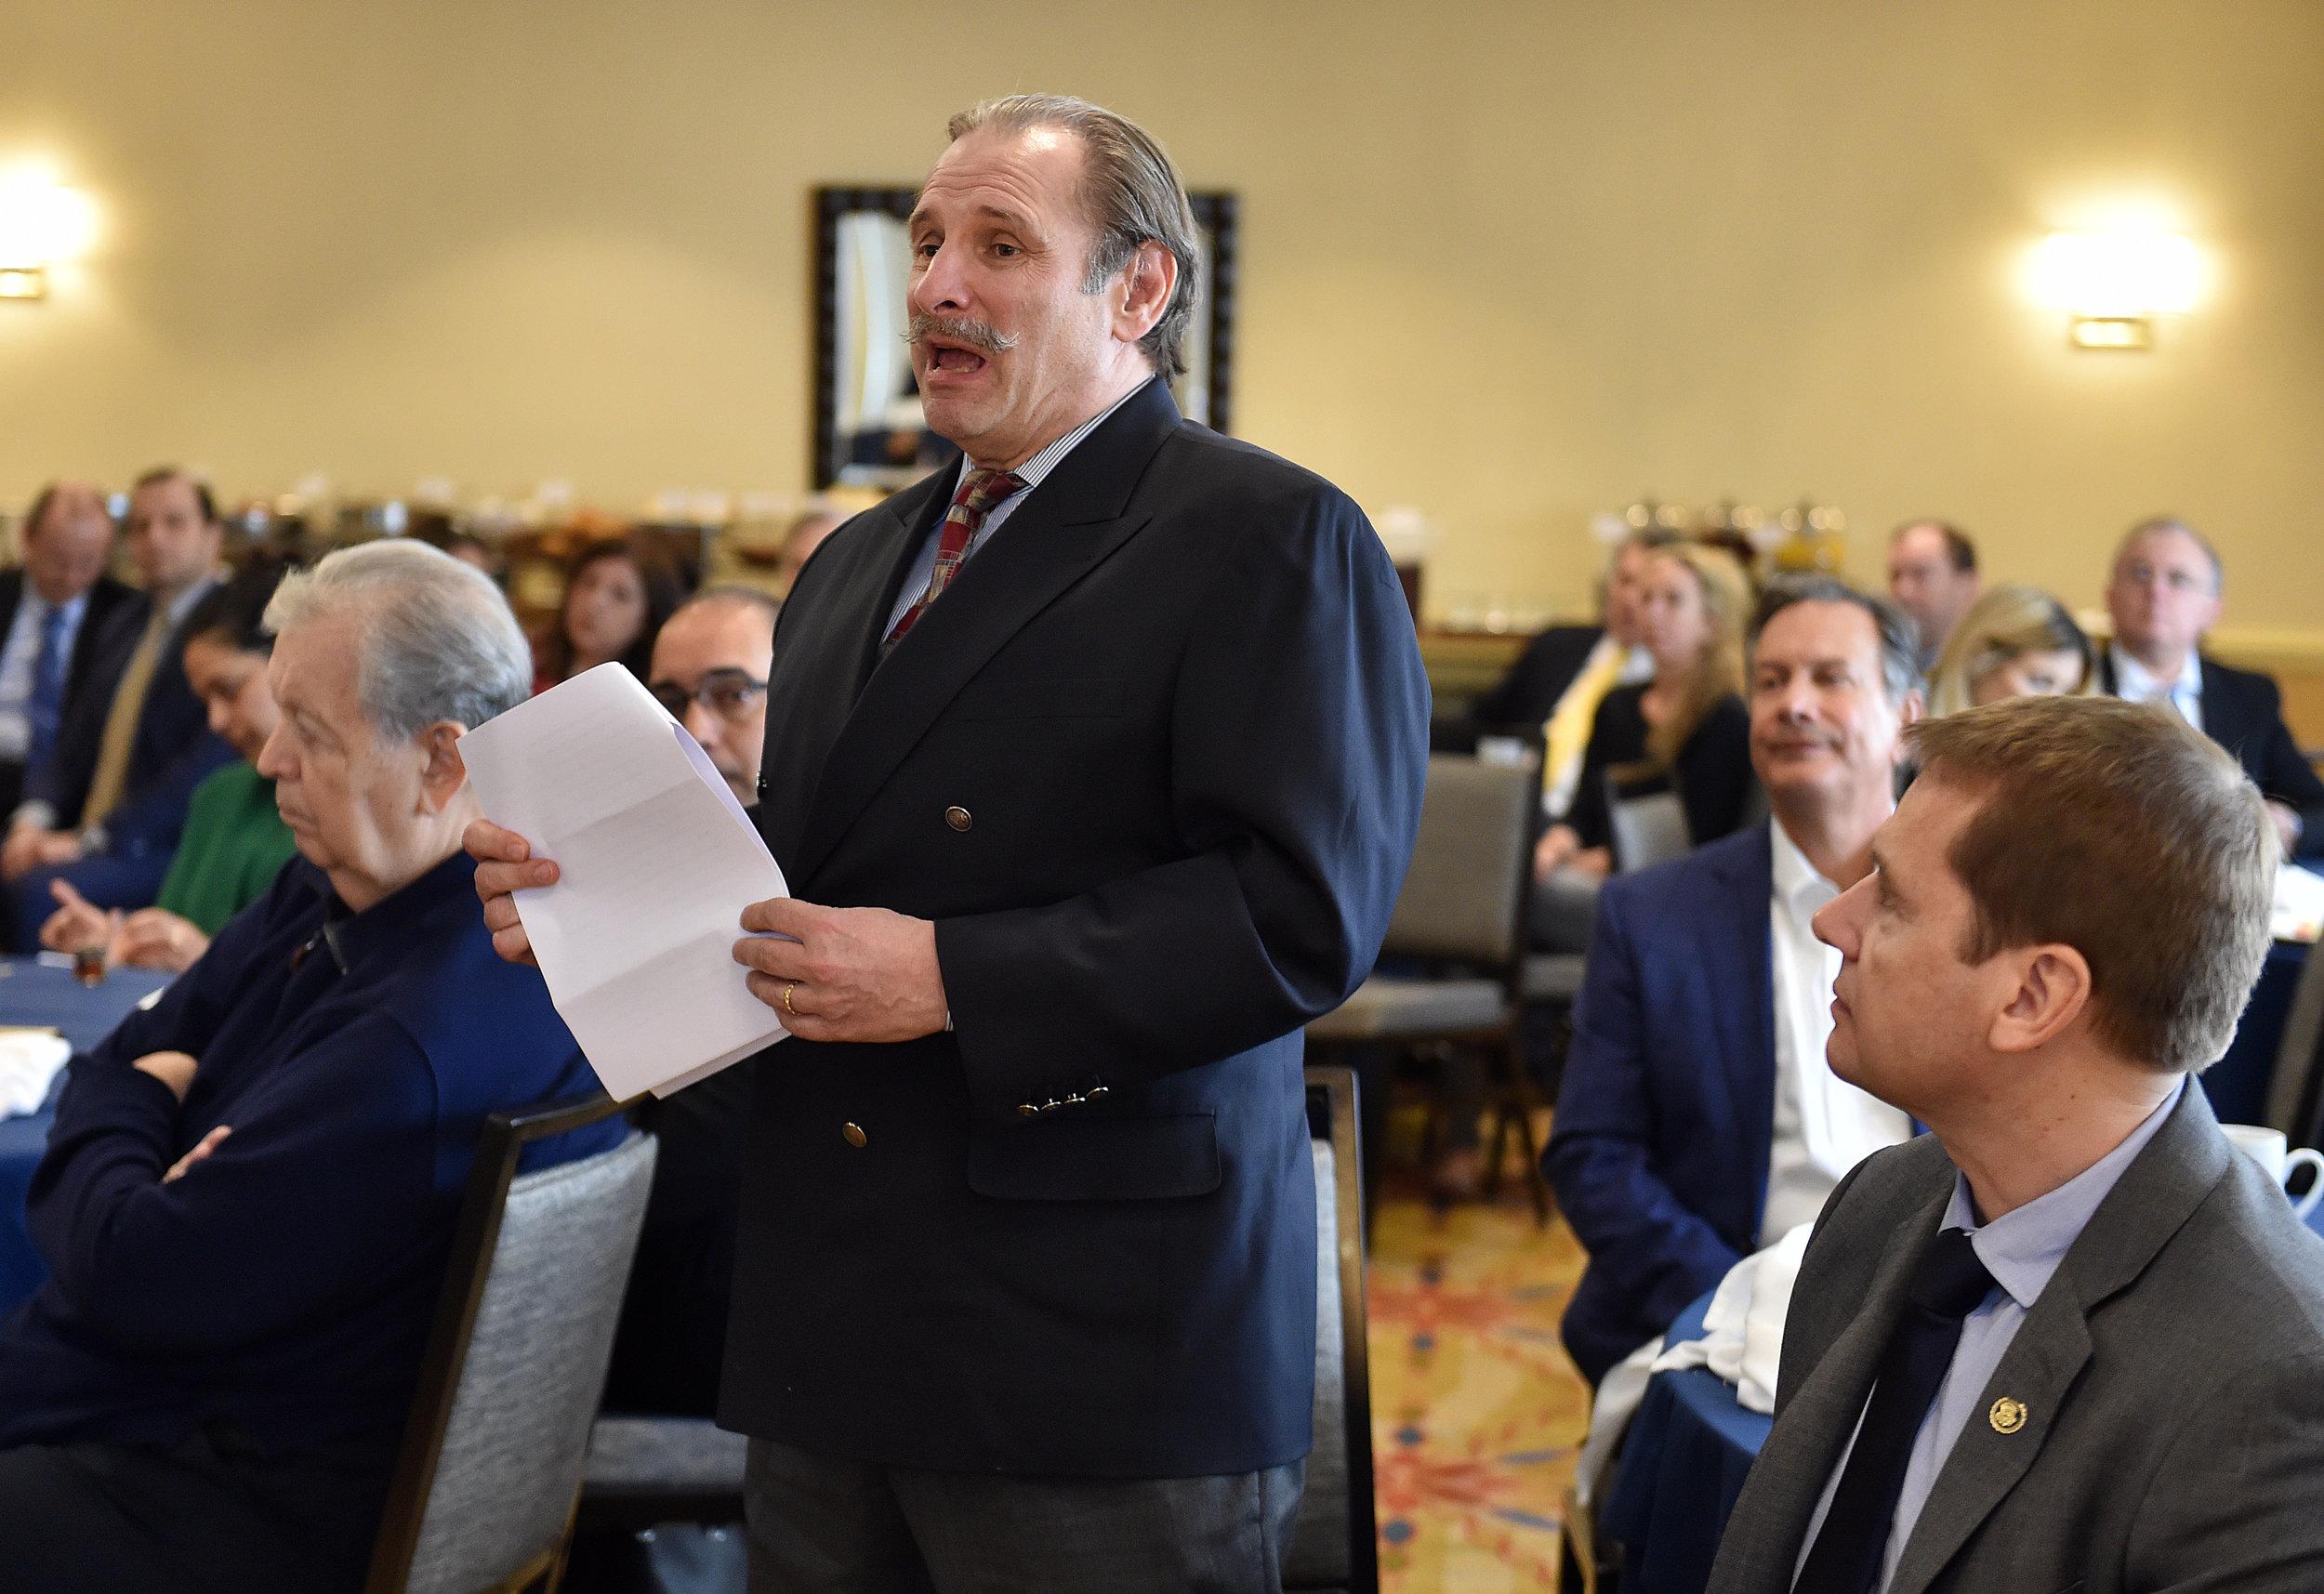 AHI Legal Counsel, Nick Karambelas, asks the panelists a question.